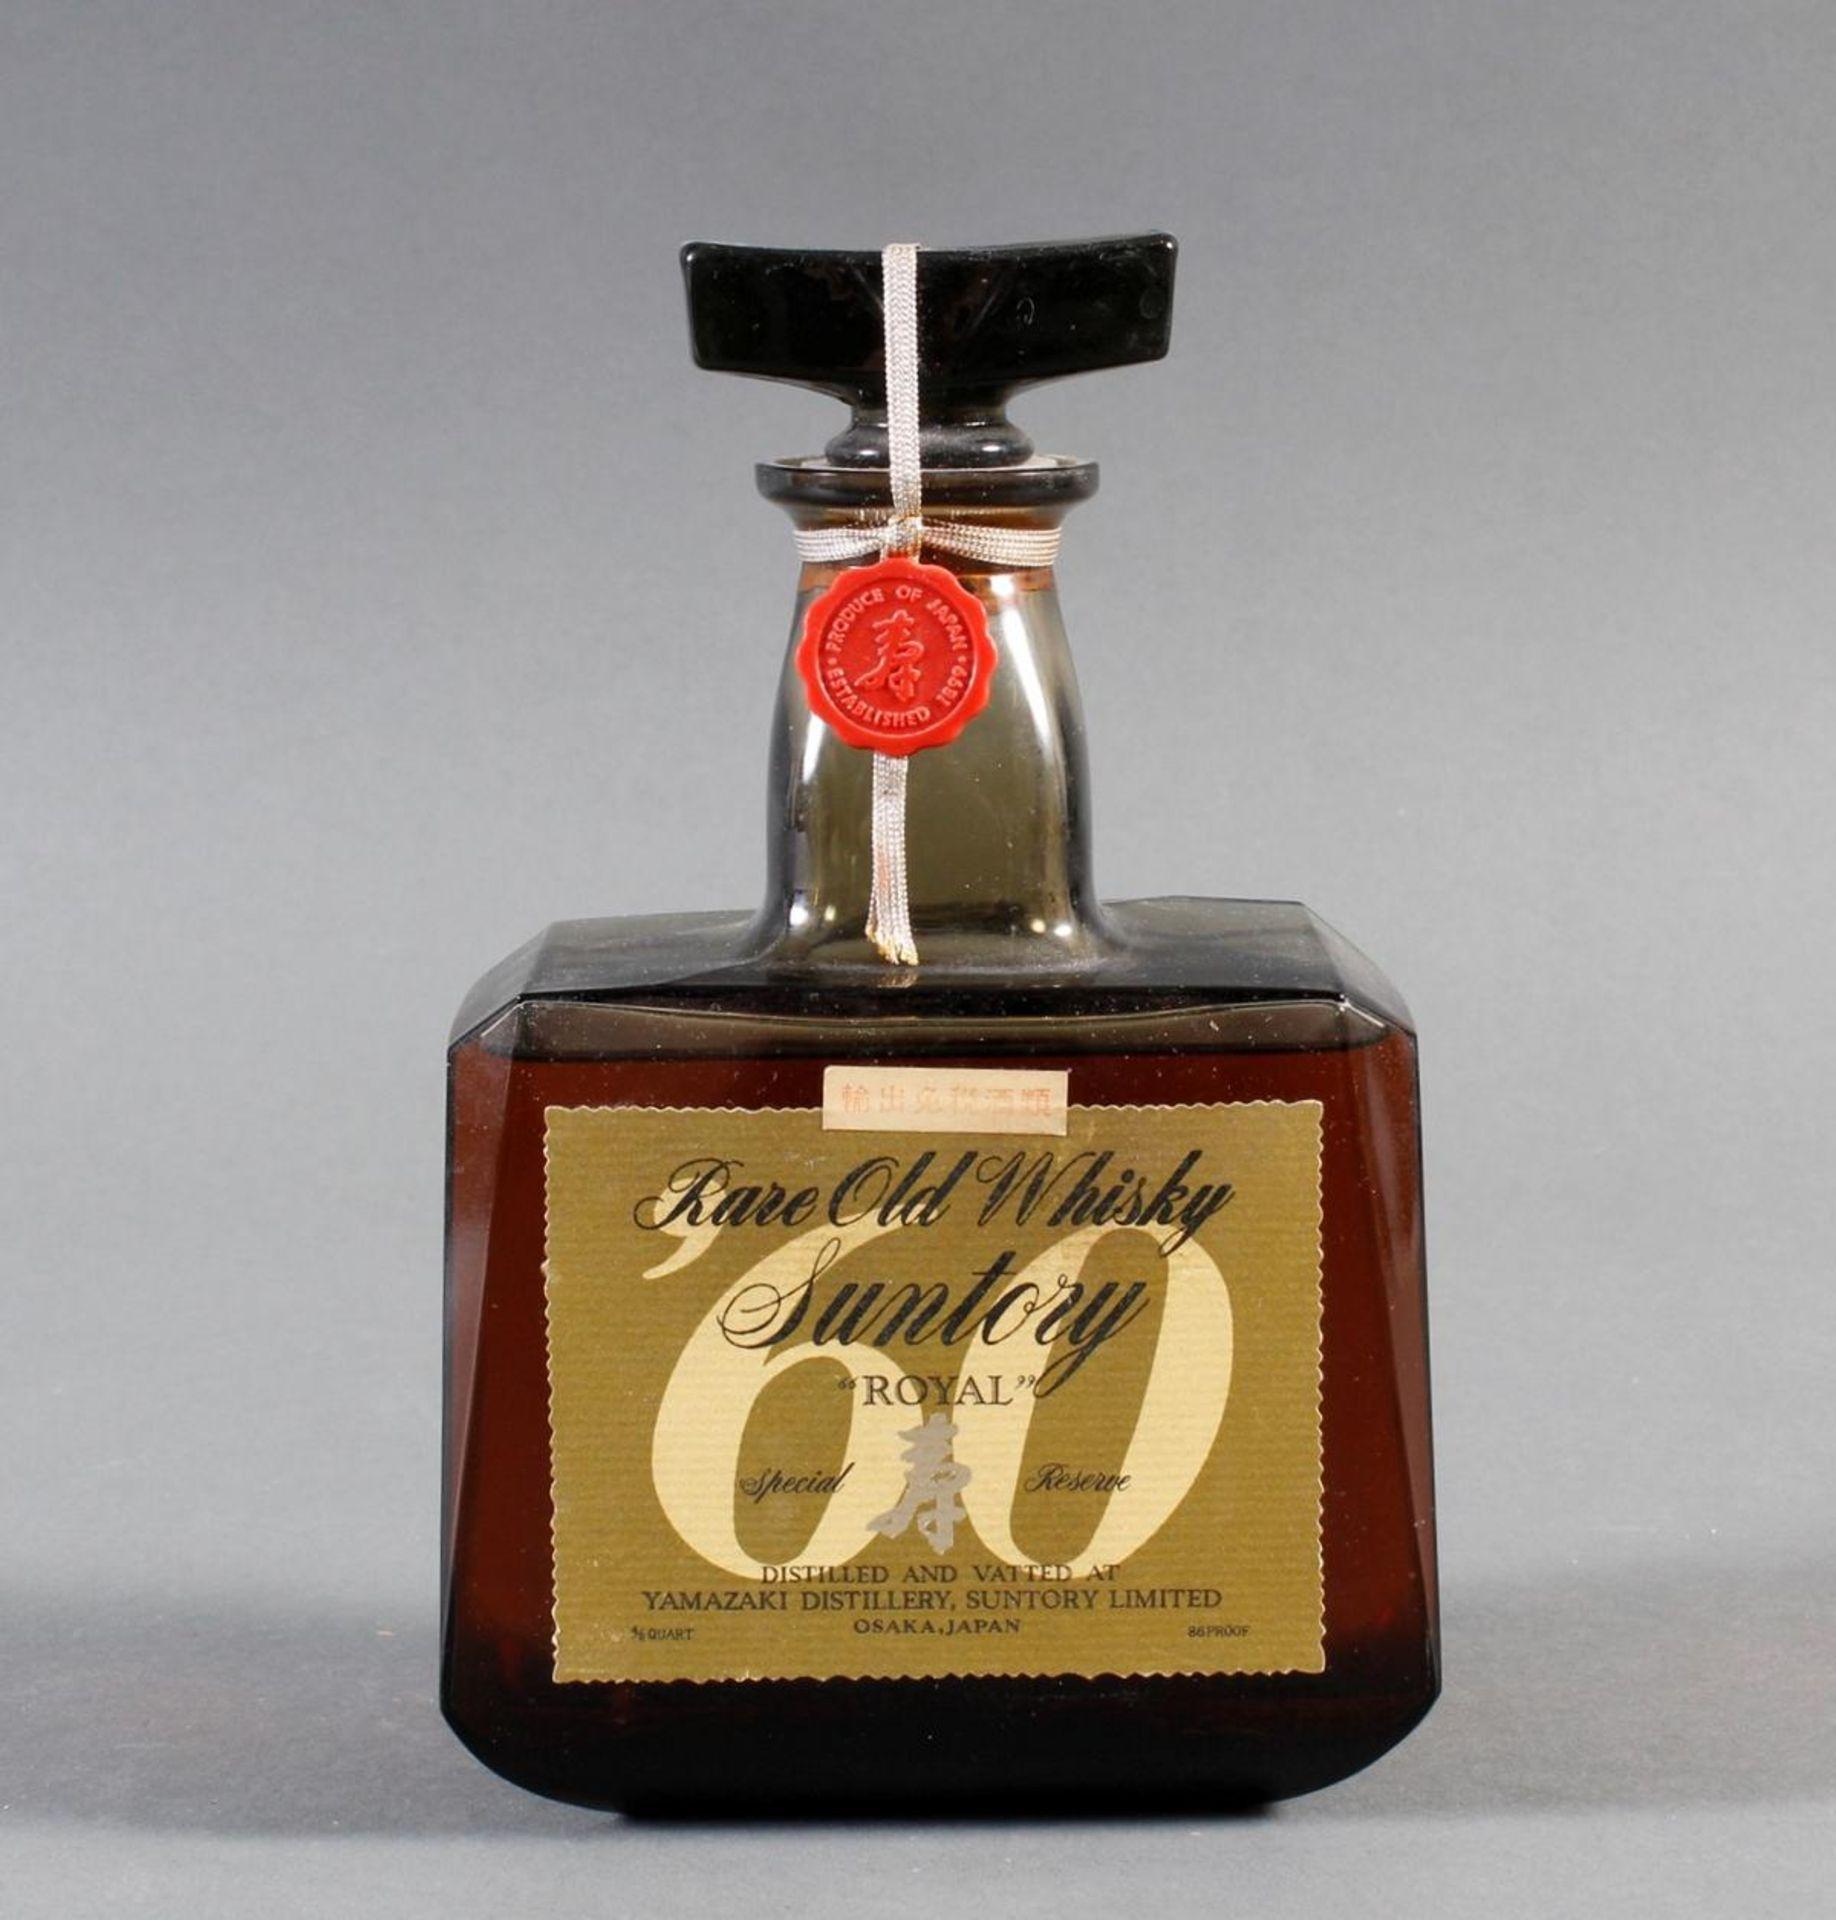 Rare Old Whisky Suntory Royal ´60 Special Reserve Yamazaki